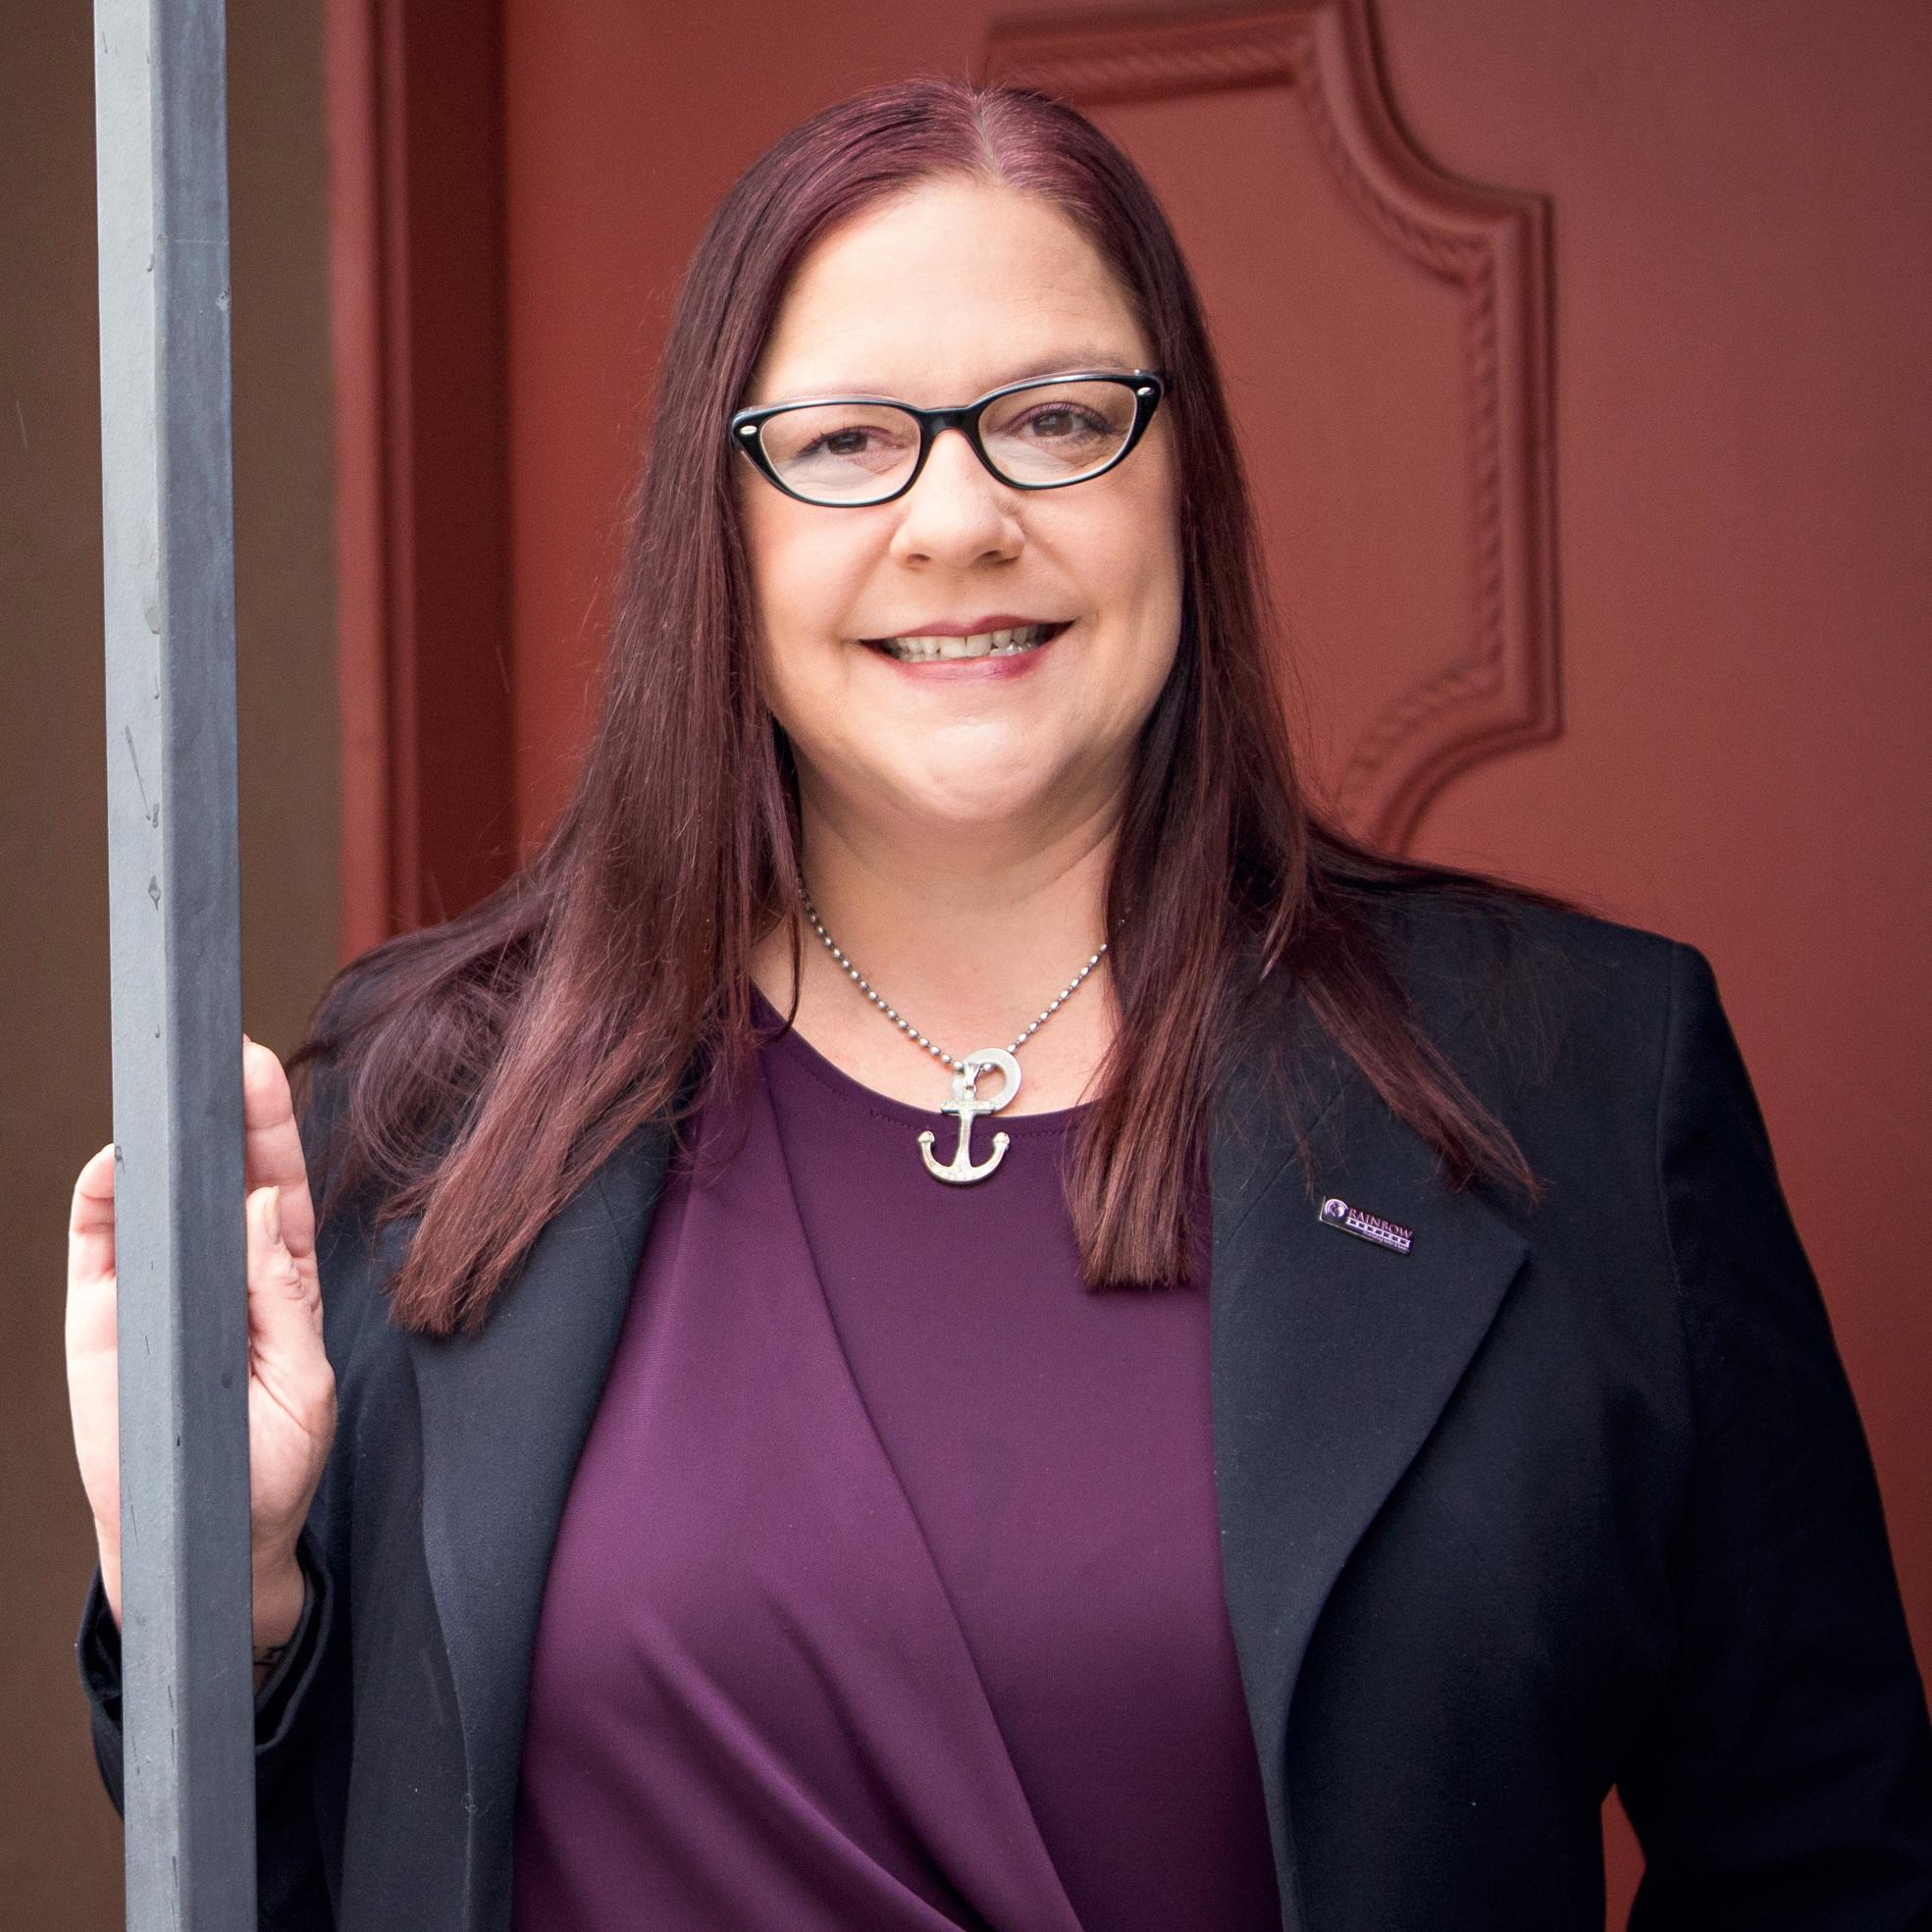 Elizabeth Eastlund, Executive Director, Rainbow Services